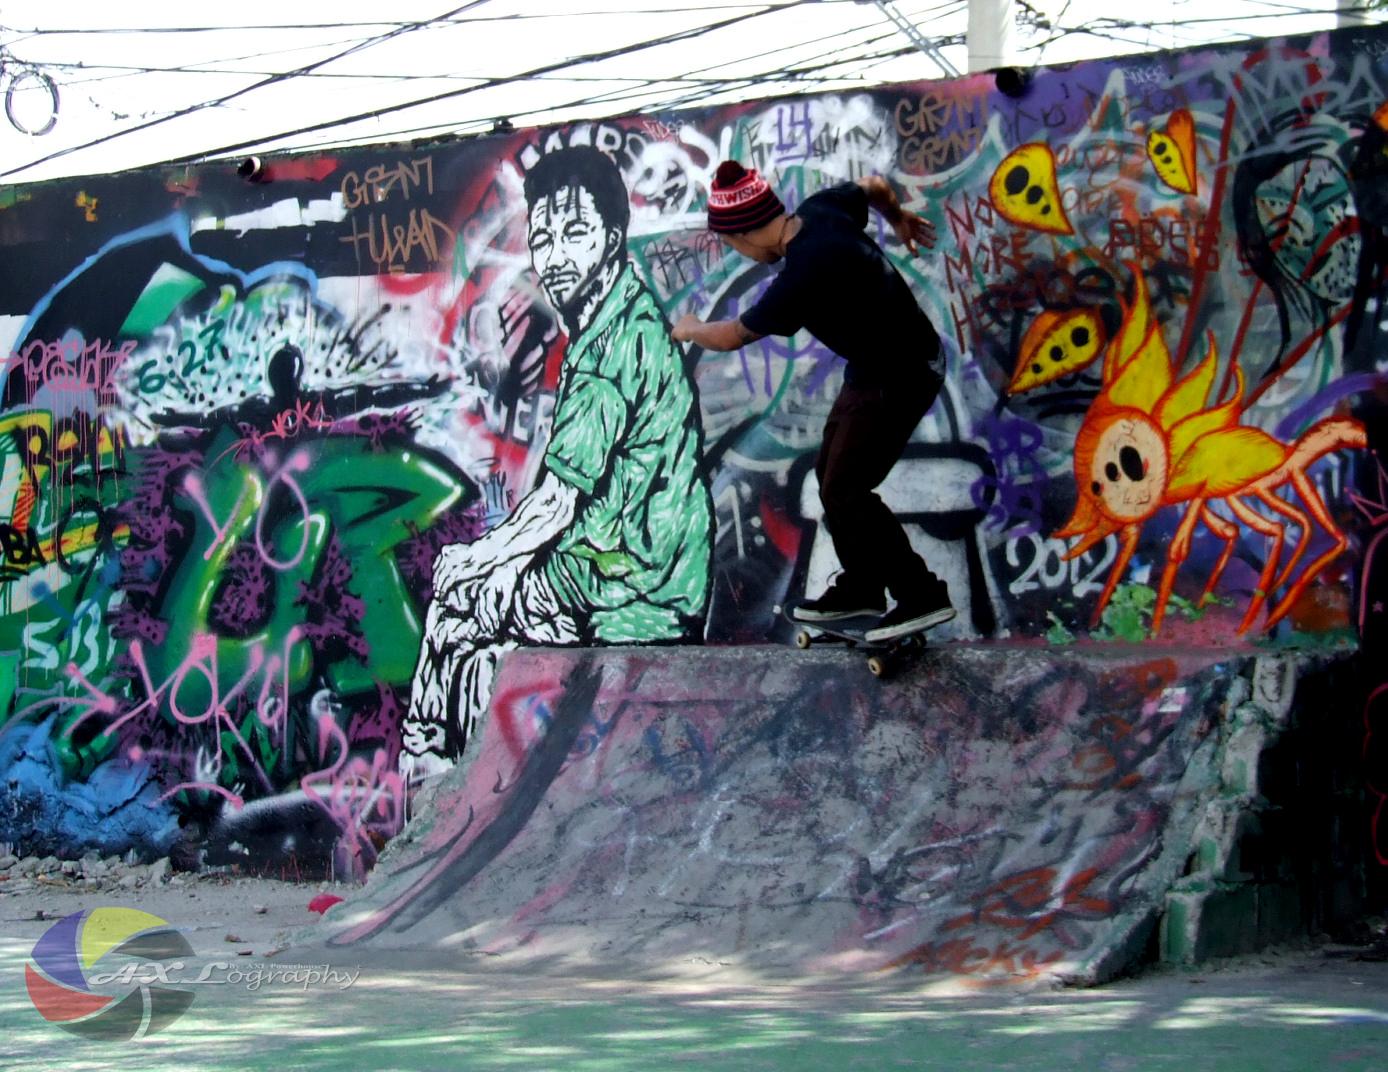 Skateboards and graffiti at intramuros axl powerhouse production the urban artworks aka graffiti altavistaventures Images